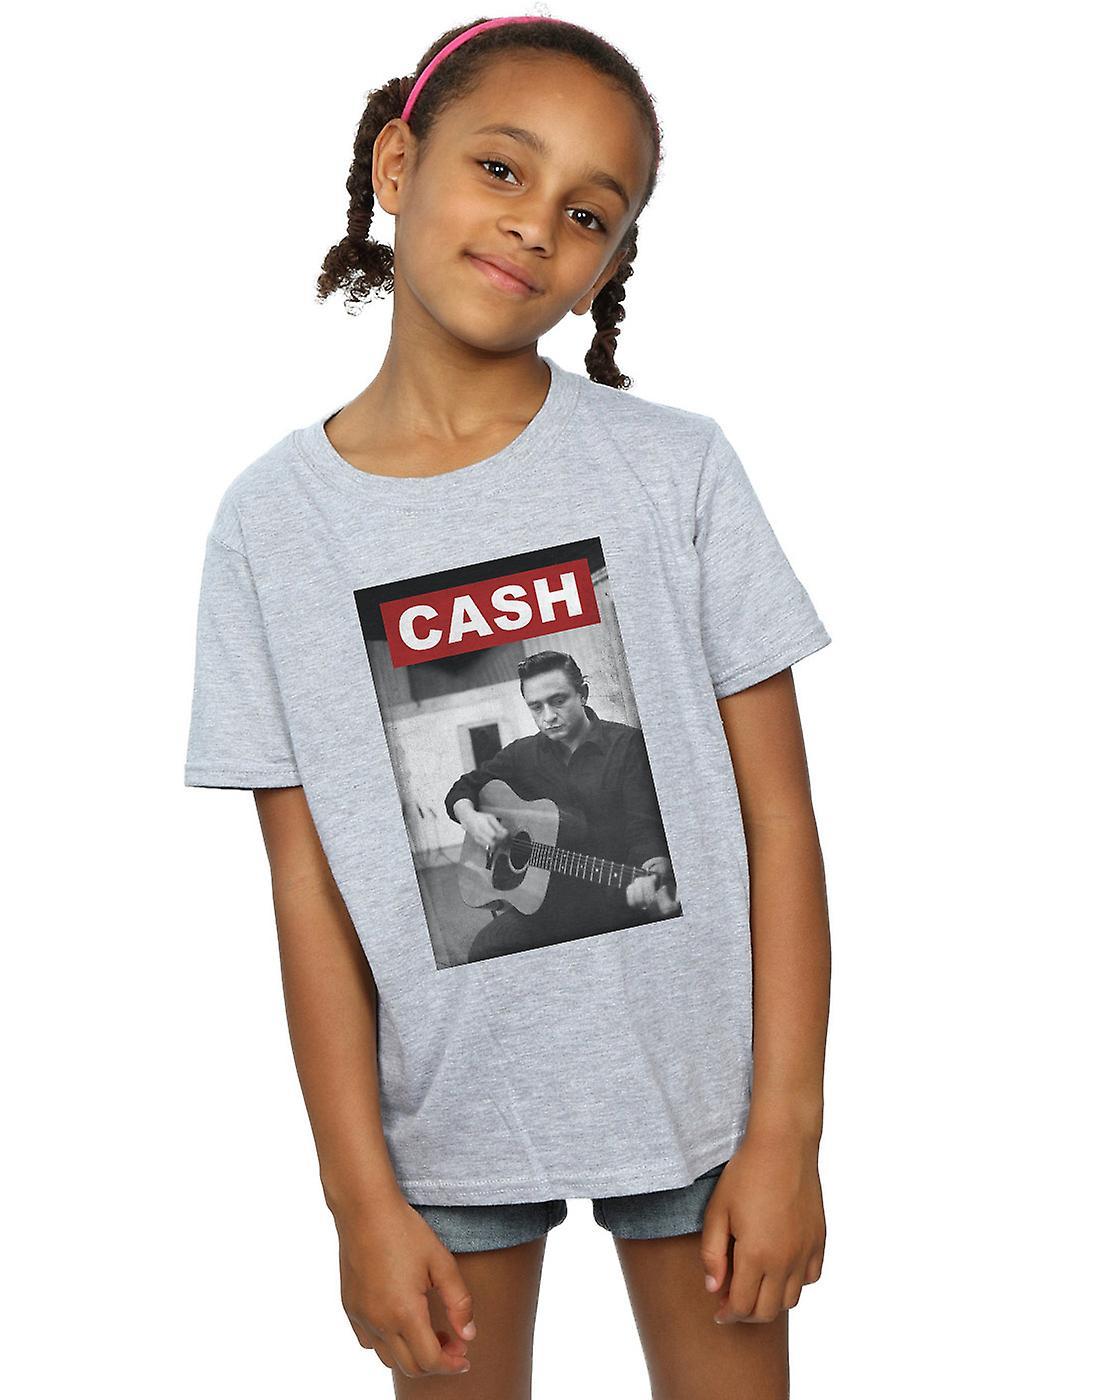 Johnny Cash Girls Guitar Photo T-Shirt